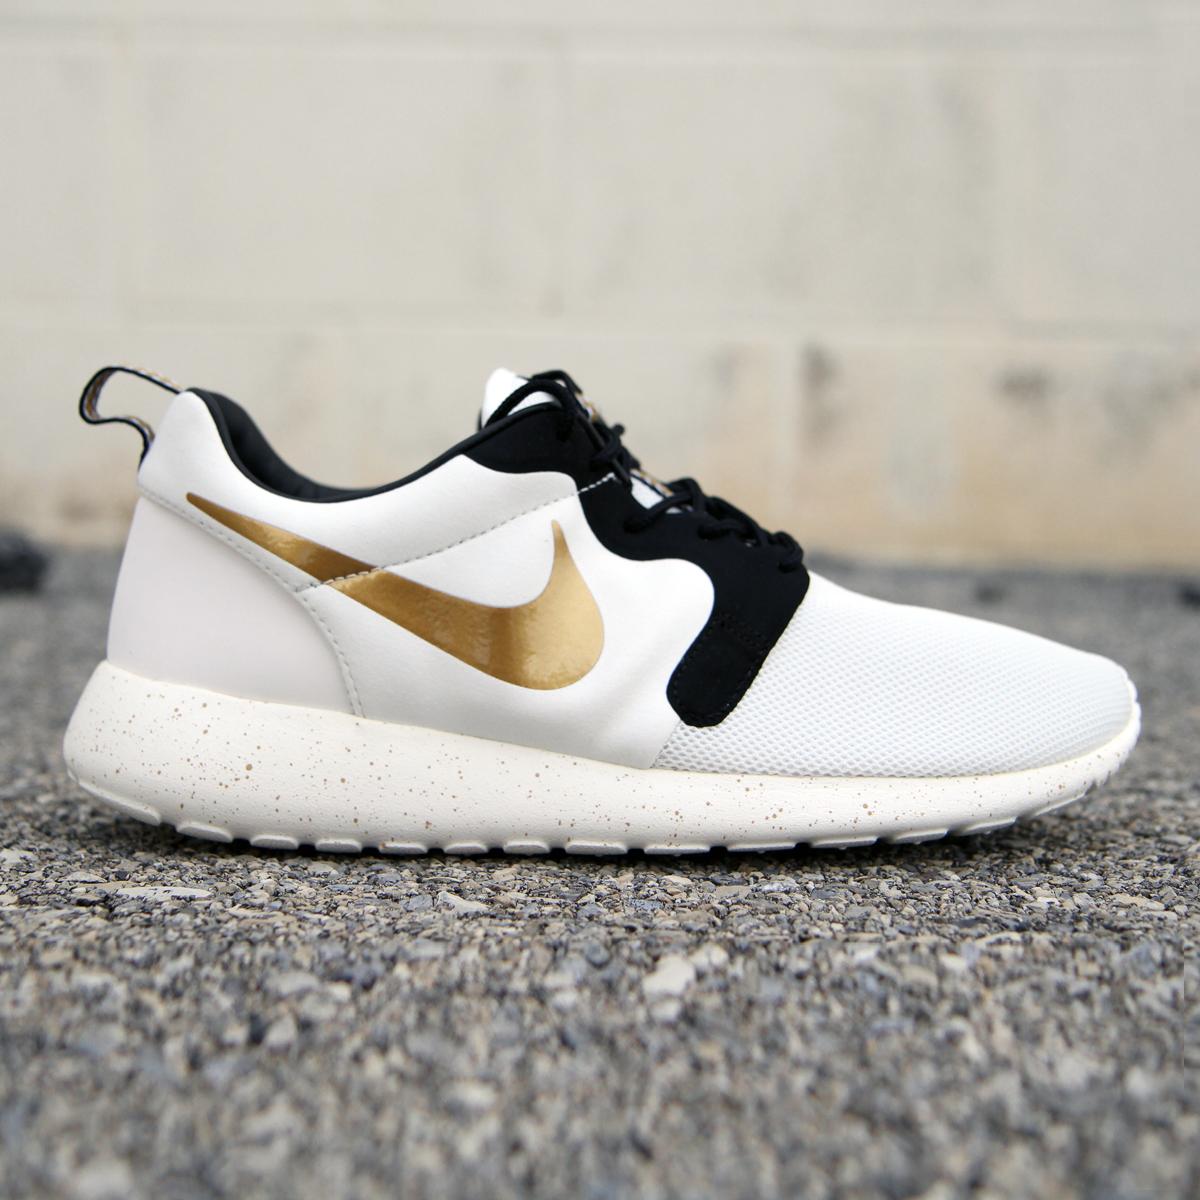 Nike Roshe Run Hyperfuse Premium (Trophy Pack)